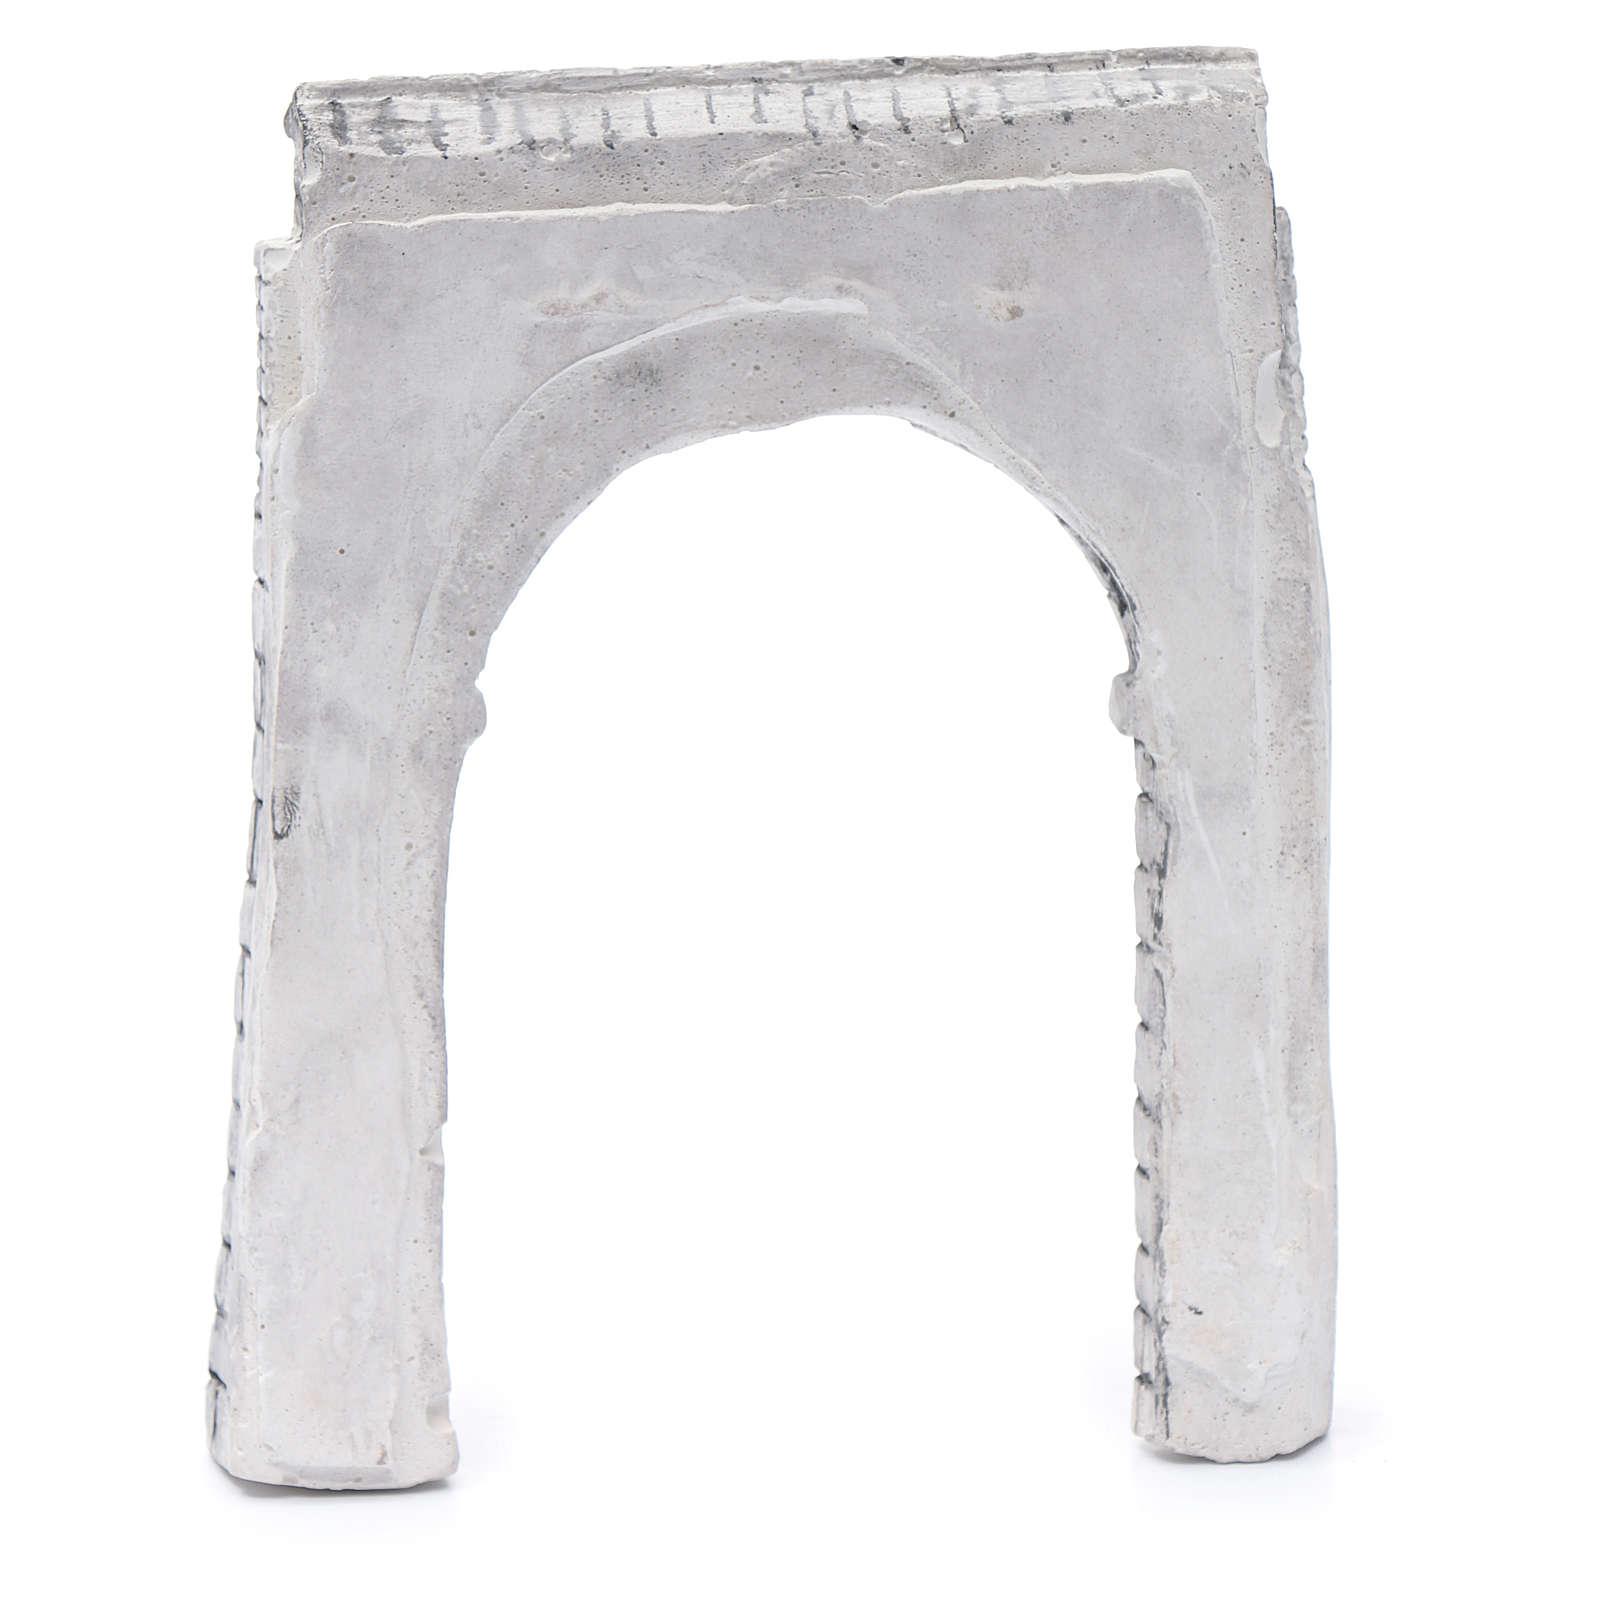 Pared de arco resina 15x15 cm para belén 4